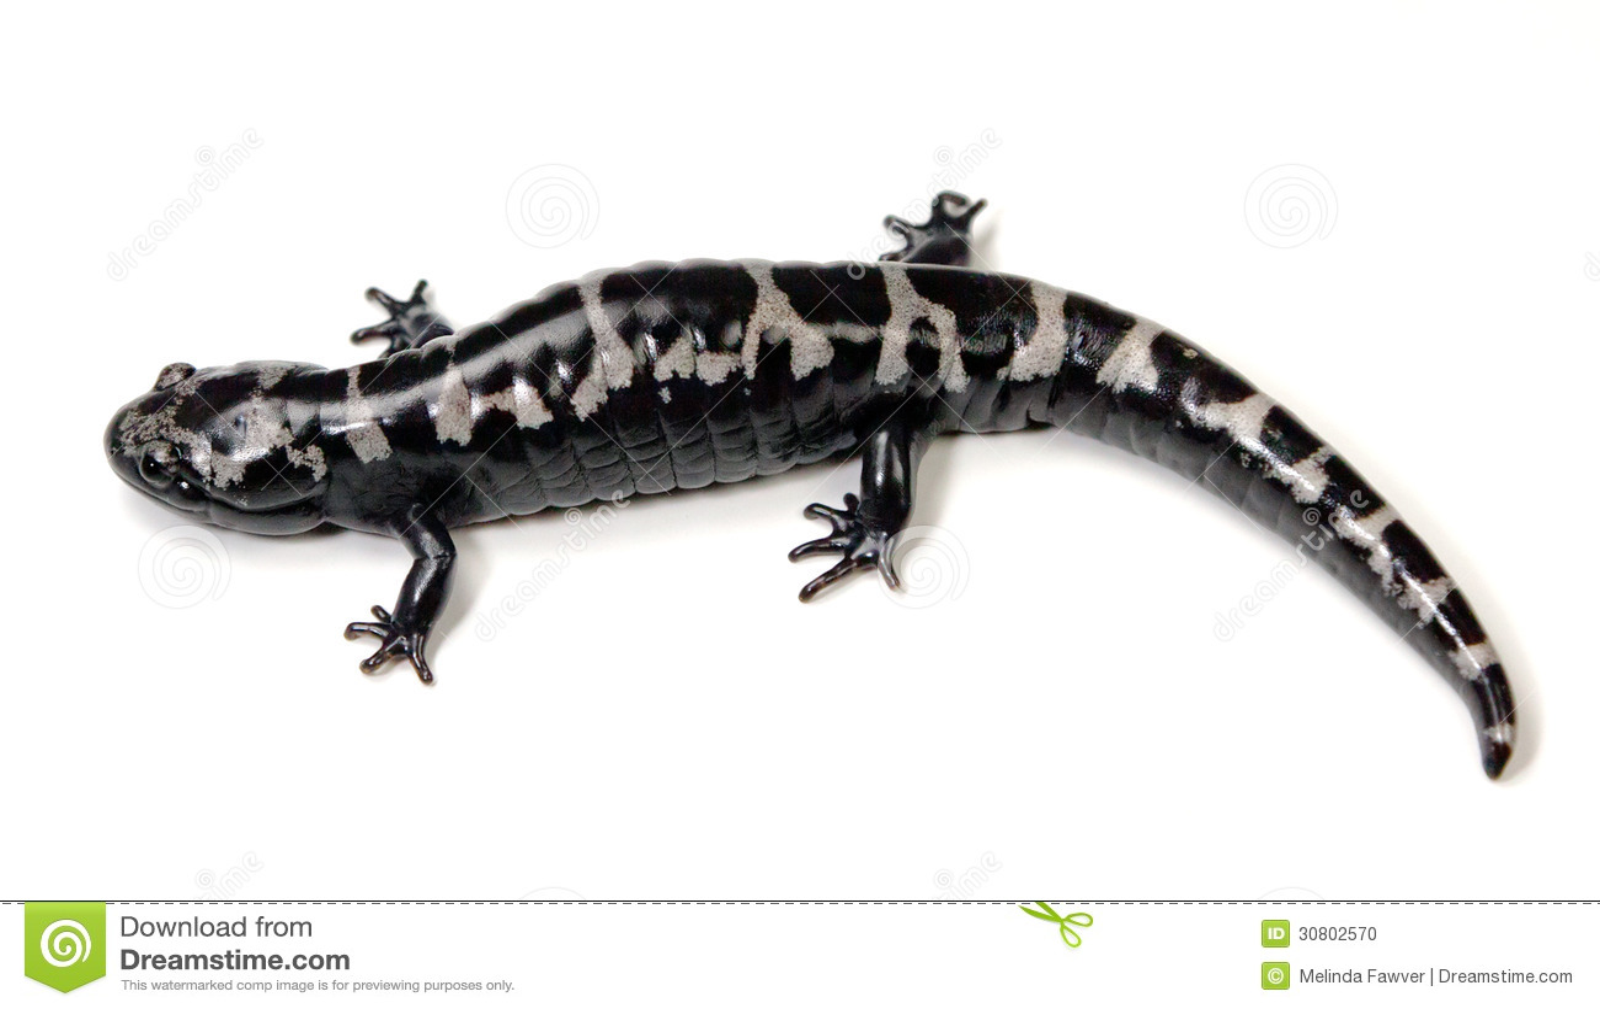 salamander white background - photo #1